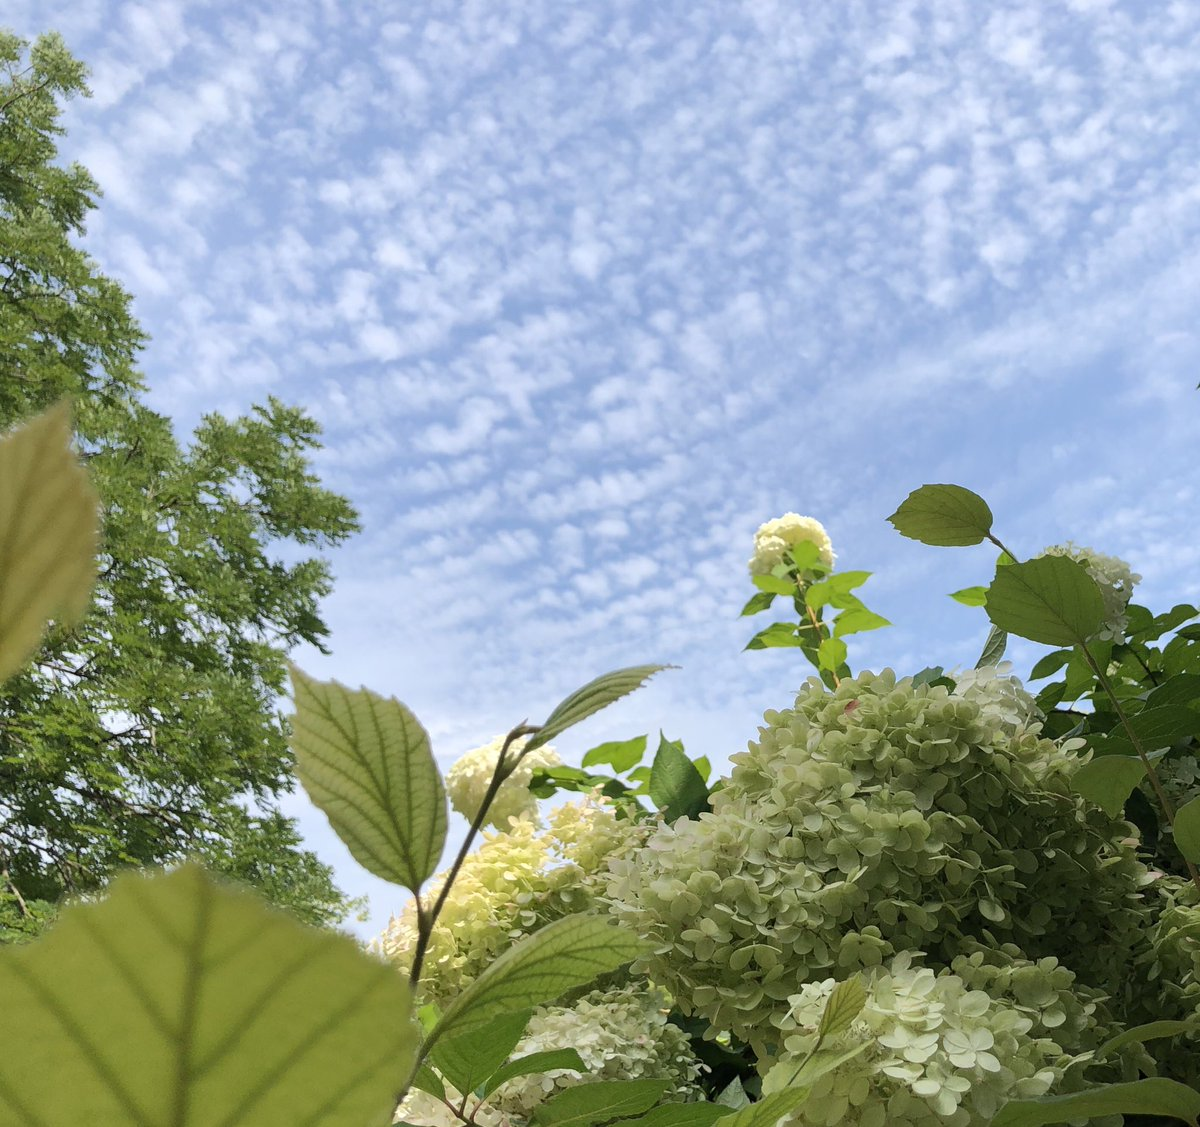 """Light tomorrow with today."" Elisabeth Barrett Browning   #Inspiration #Spirit #Sublime #BePresent #Beauty #BeLight #BeHappy #Grateful #Abundant #Blessings #BeautifulWorld #4ALL #InfiniteLOVE https://t.co/ACAC1gLpHA"